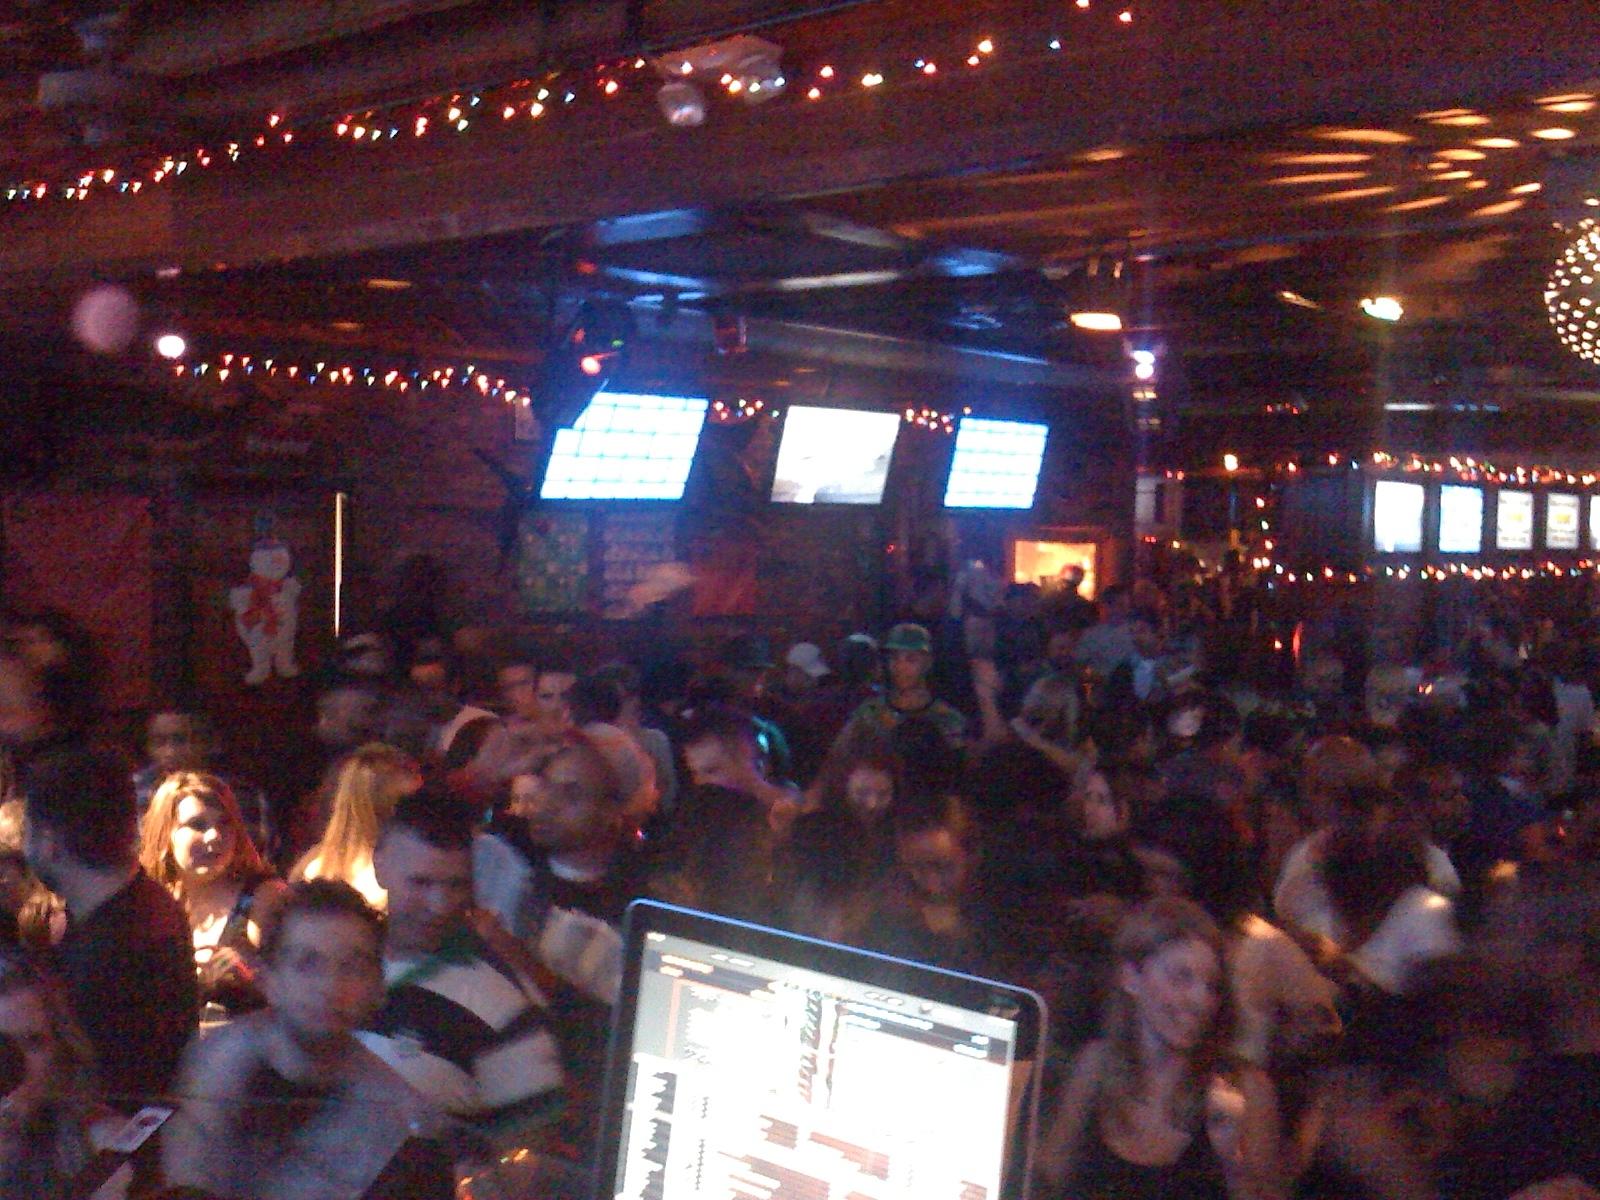 Nightclub - The Tavern, Pacific Beach